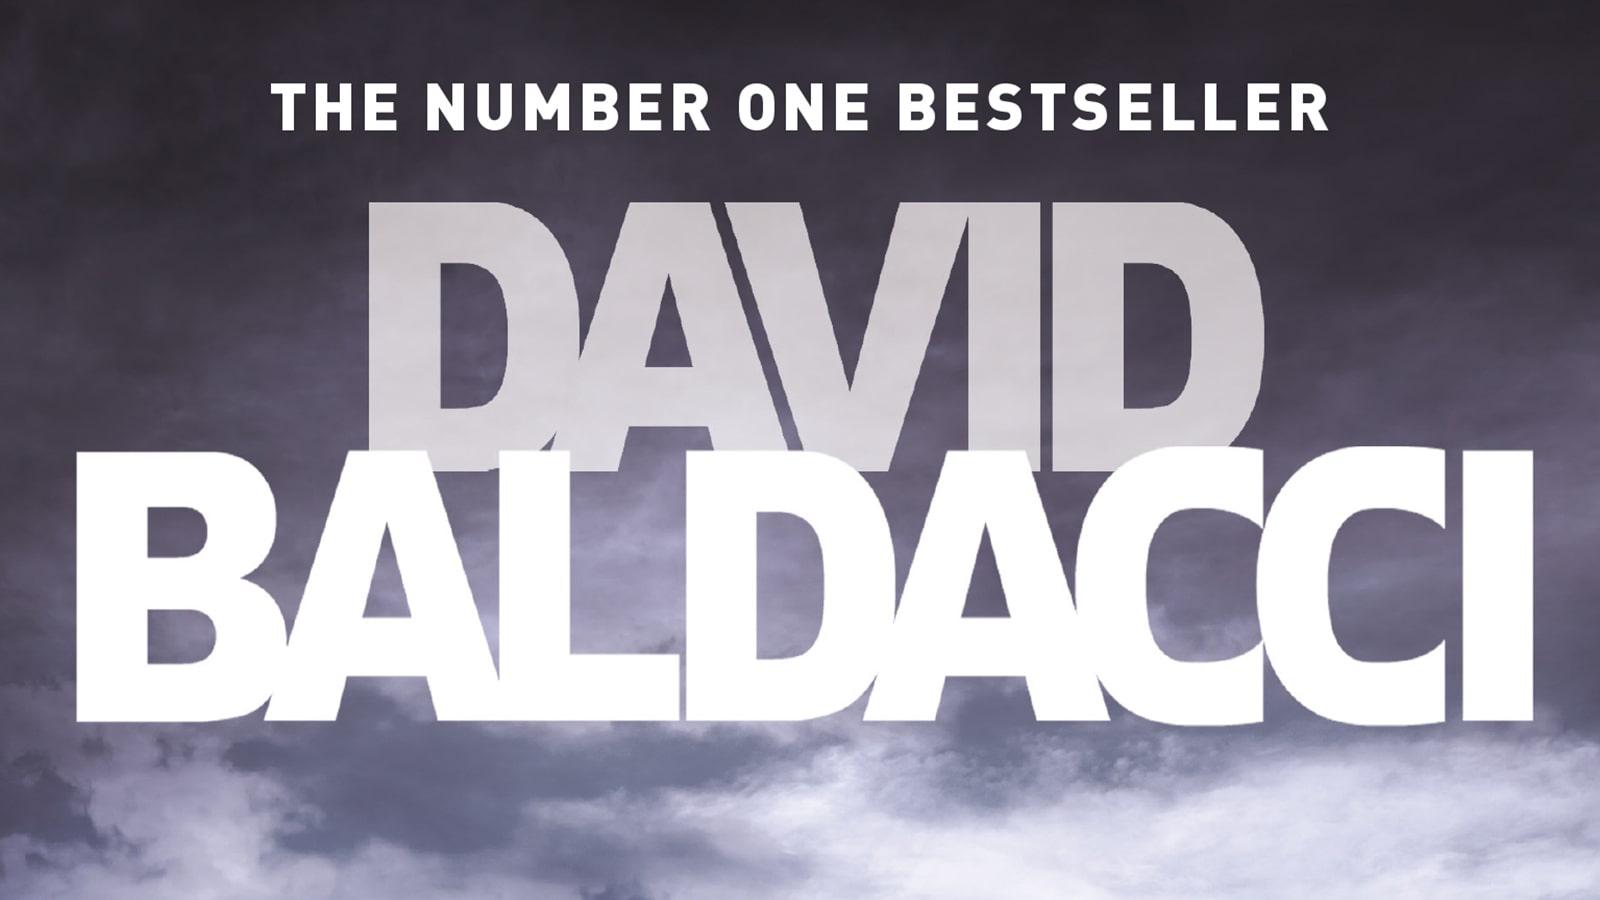 The Target David Baldacci Pdf